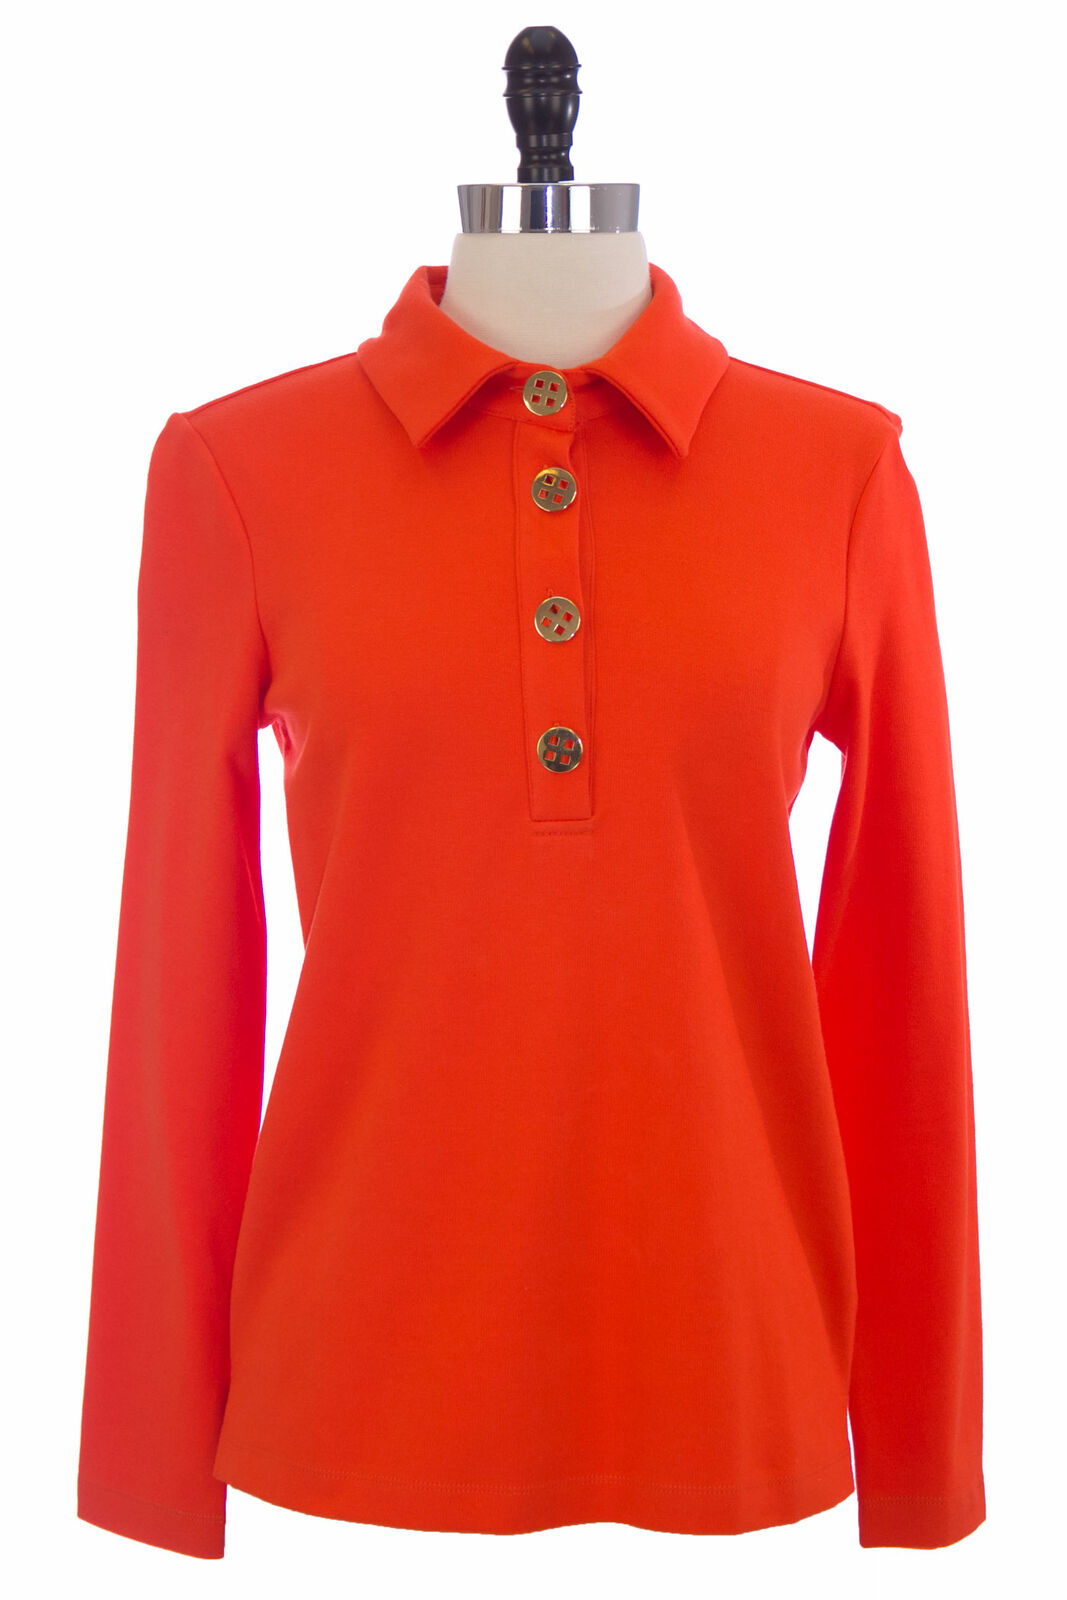 Elizabeth Mckay Orange Baumwollmischung Langärmlig Polohemd 7053 Nwt